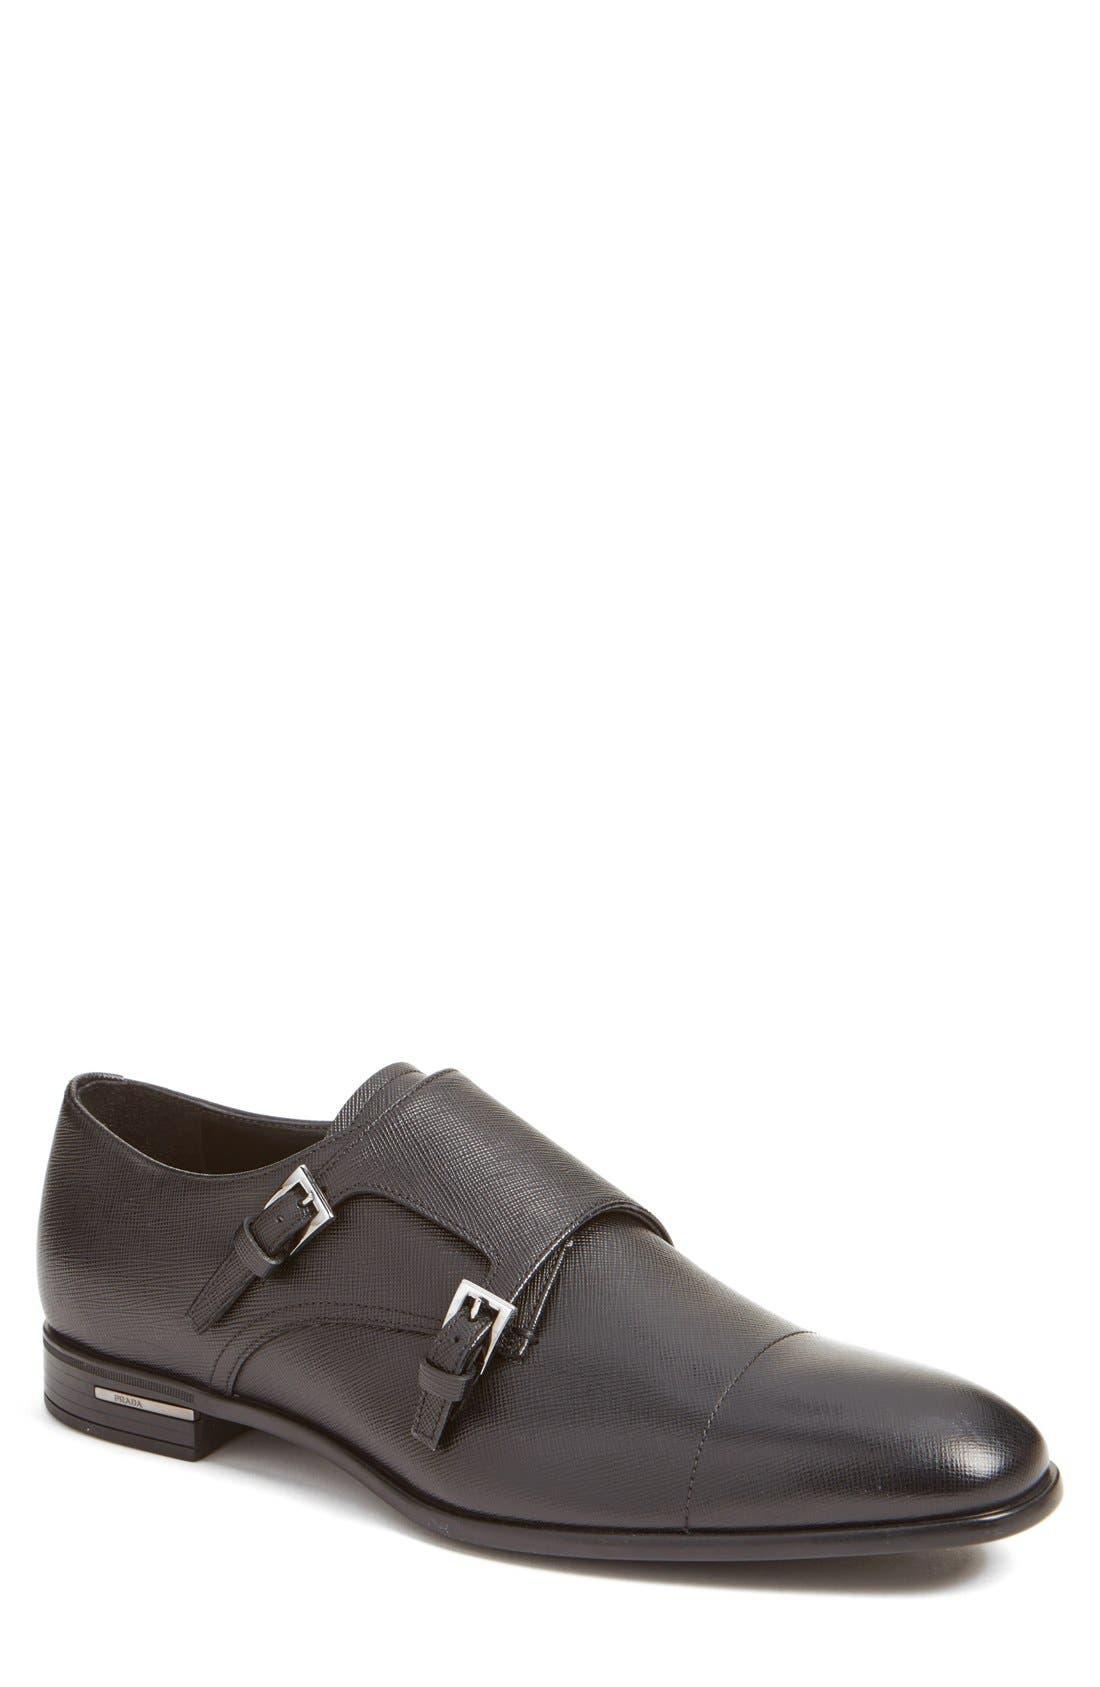 Alternate Image 1 Selected - Prada Double Monk Strap Shoe (Men)